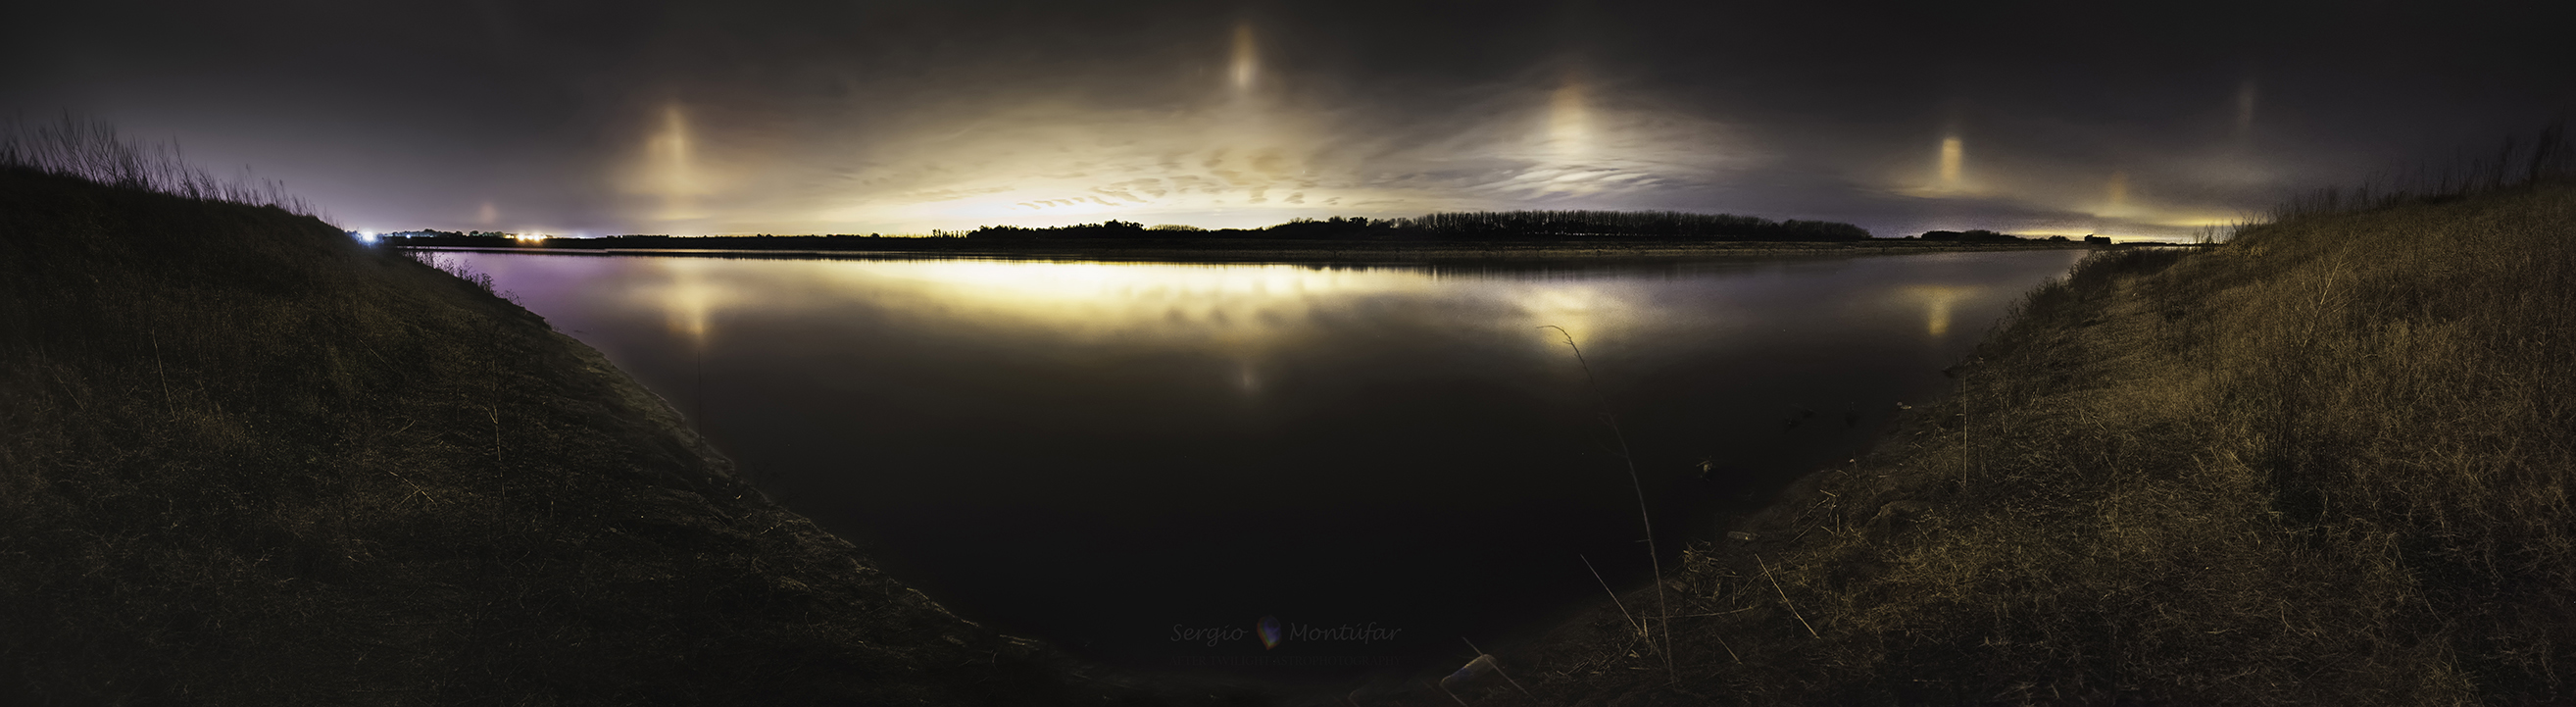 Light Pillars from Argentina by Montufar